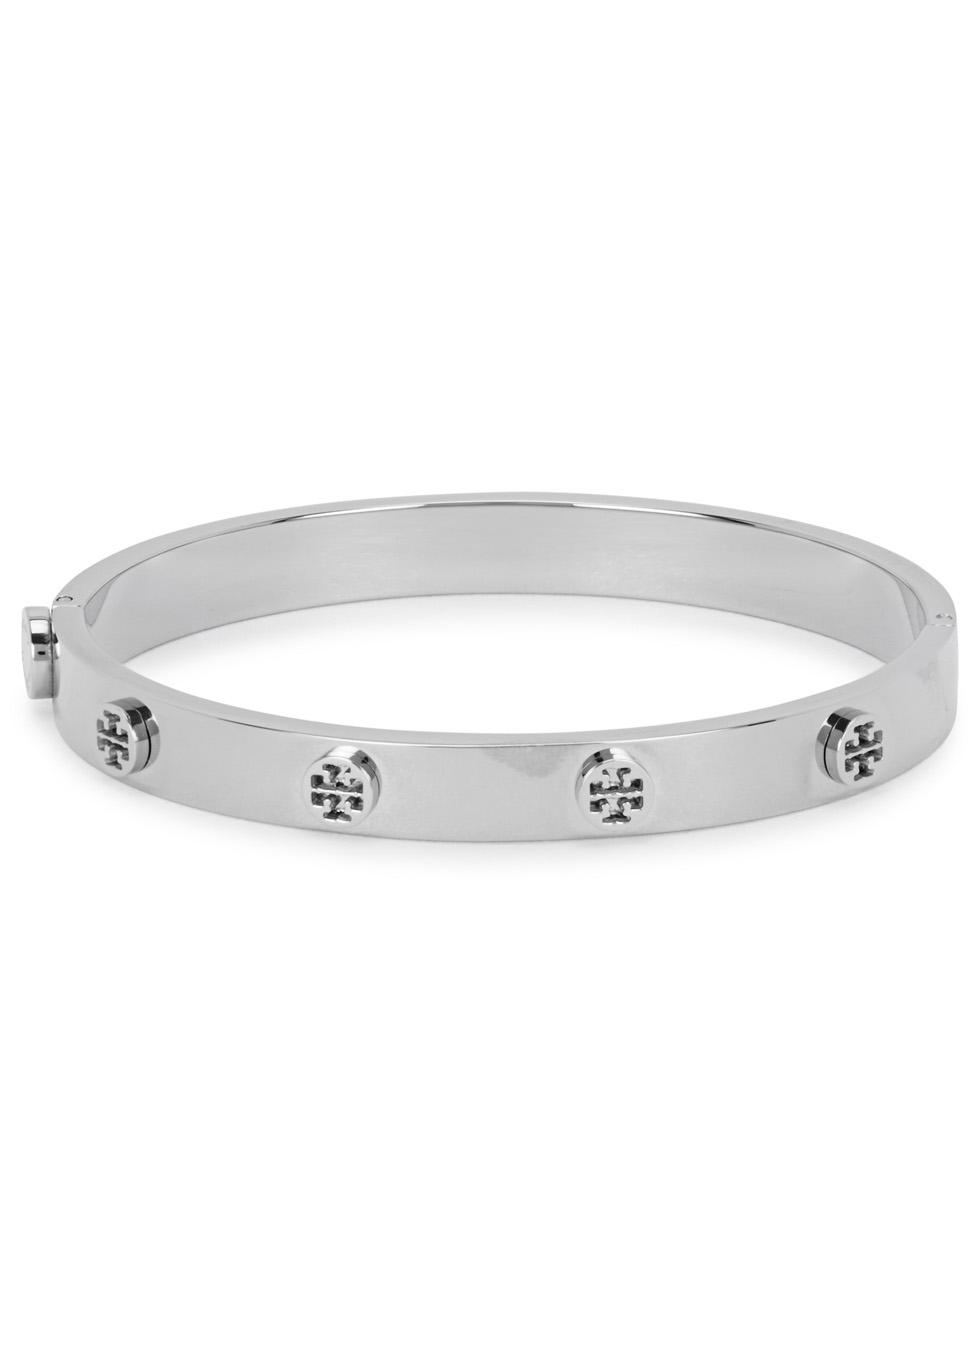 Silver tone logo bracelet - Tory Burch